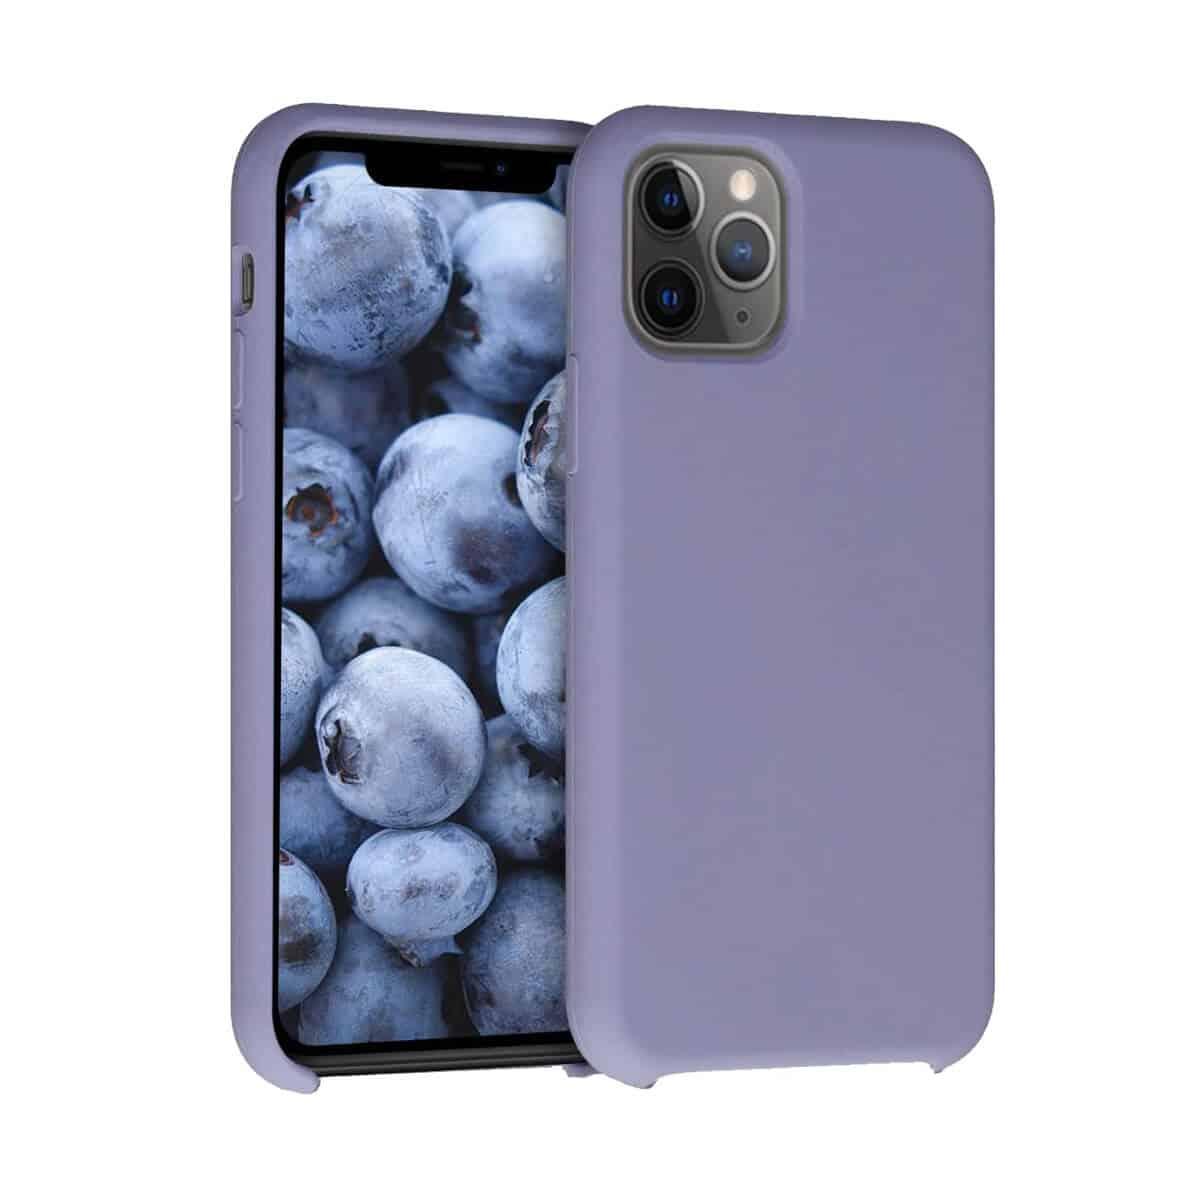 carcasa-edman-pentru-iphone-11-pro-max-rock-blue-gri